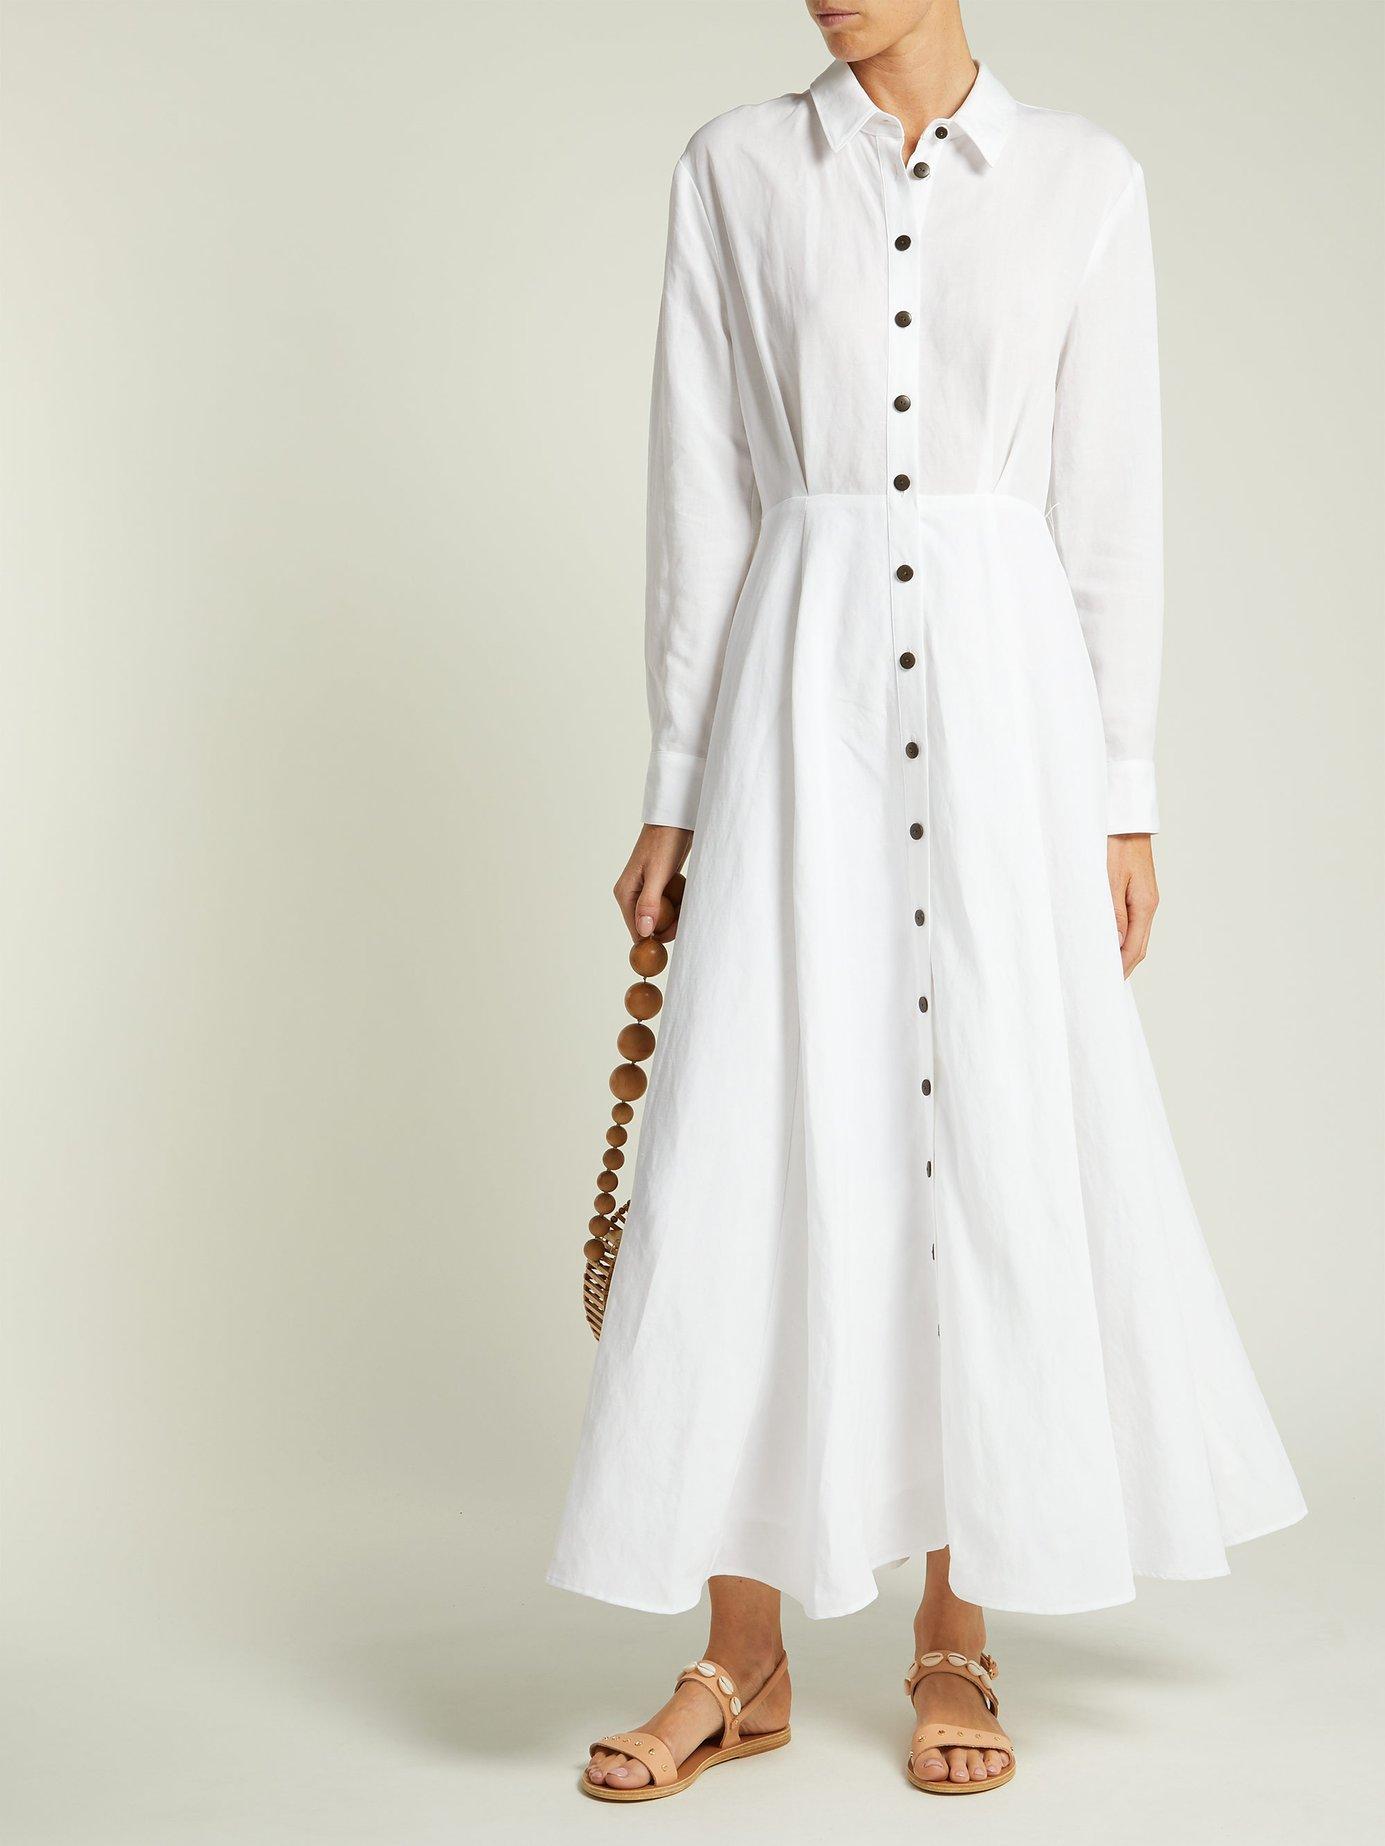 Michelle Tencel® Lyocell and linen midi dress by Mara Hoffman